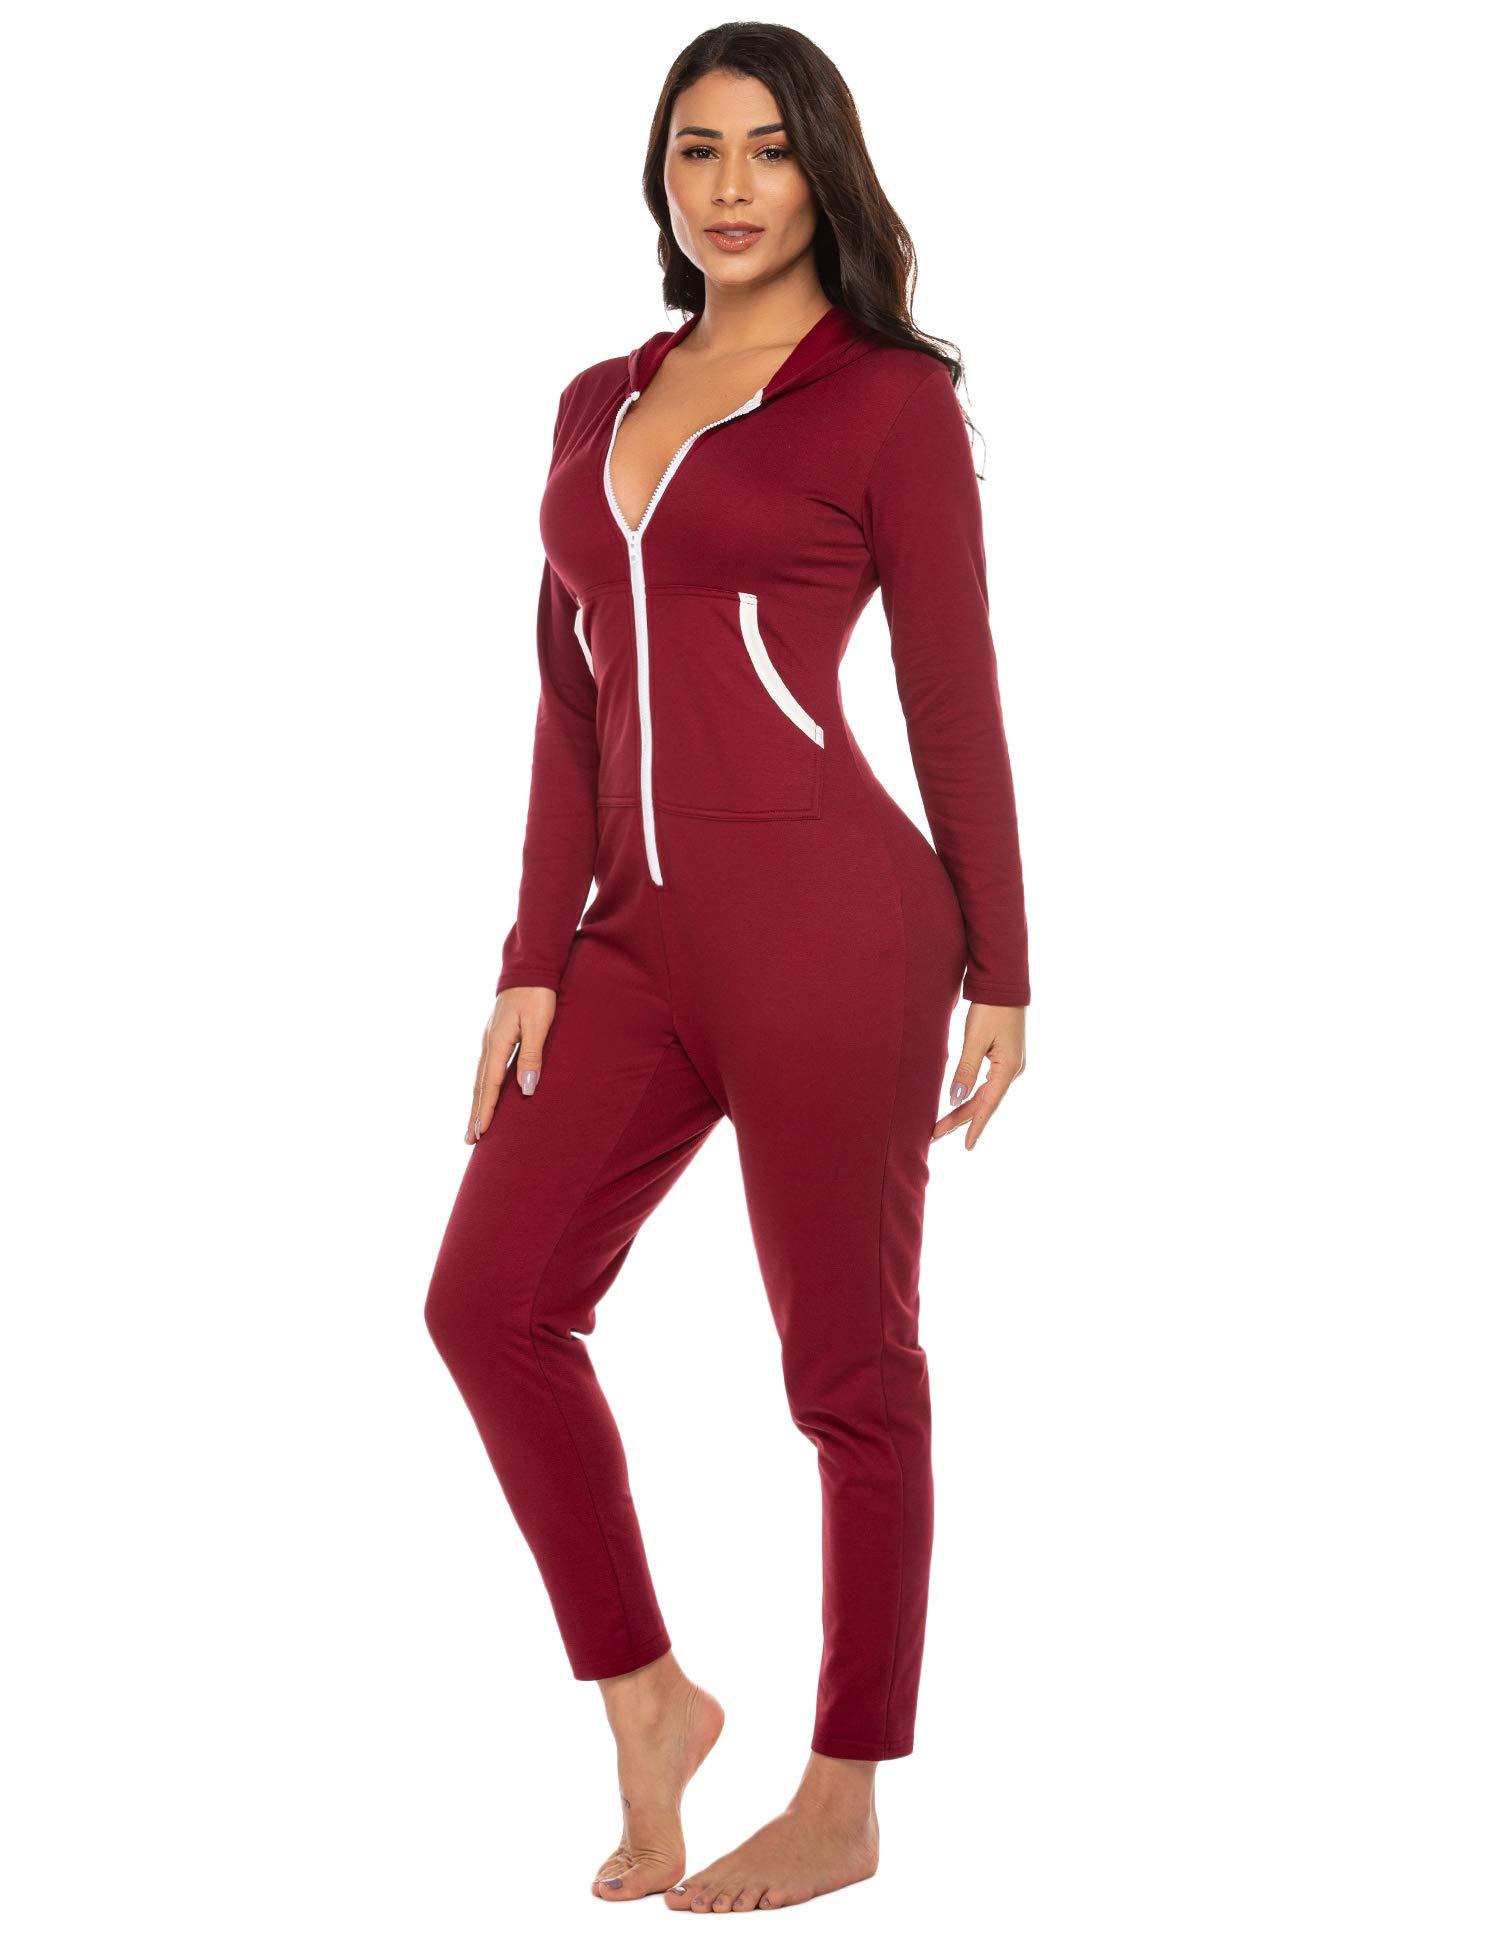 Ekouaer Onesies Underwear Set Christmas Union Jumpsuit One Piece Pajama Hooded Sweatshirt Sleepwear for Women